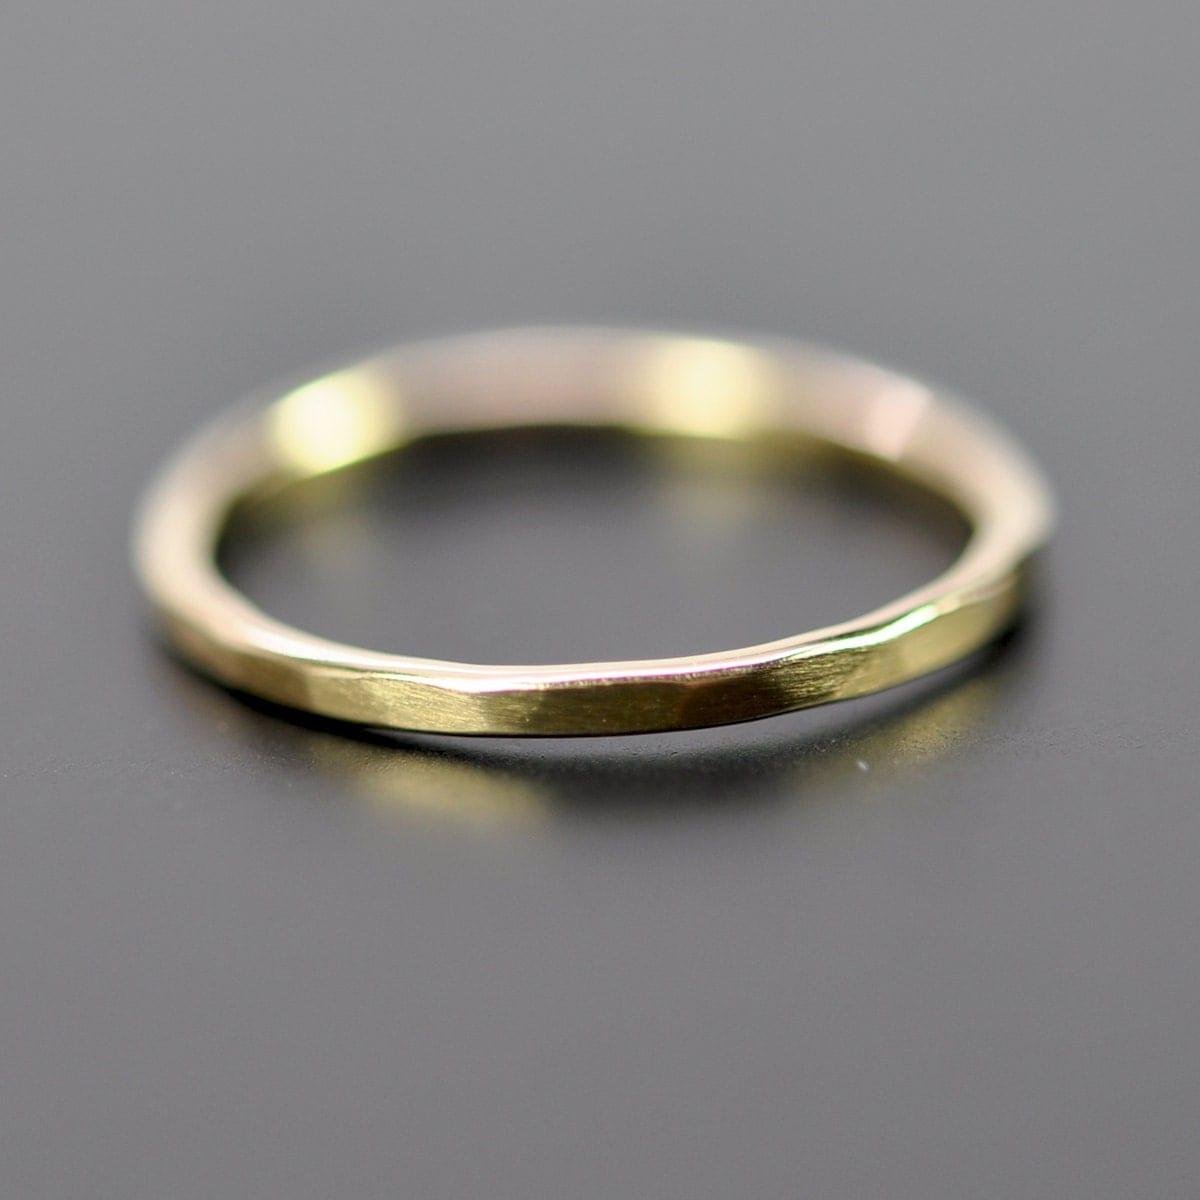 yellow gold 1mm wedding band or fashion ring 18k